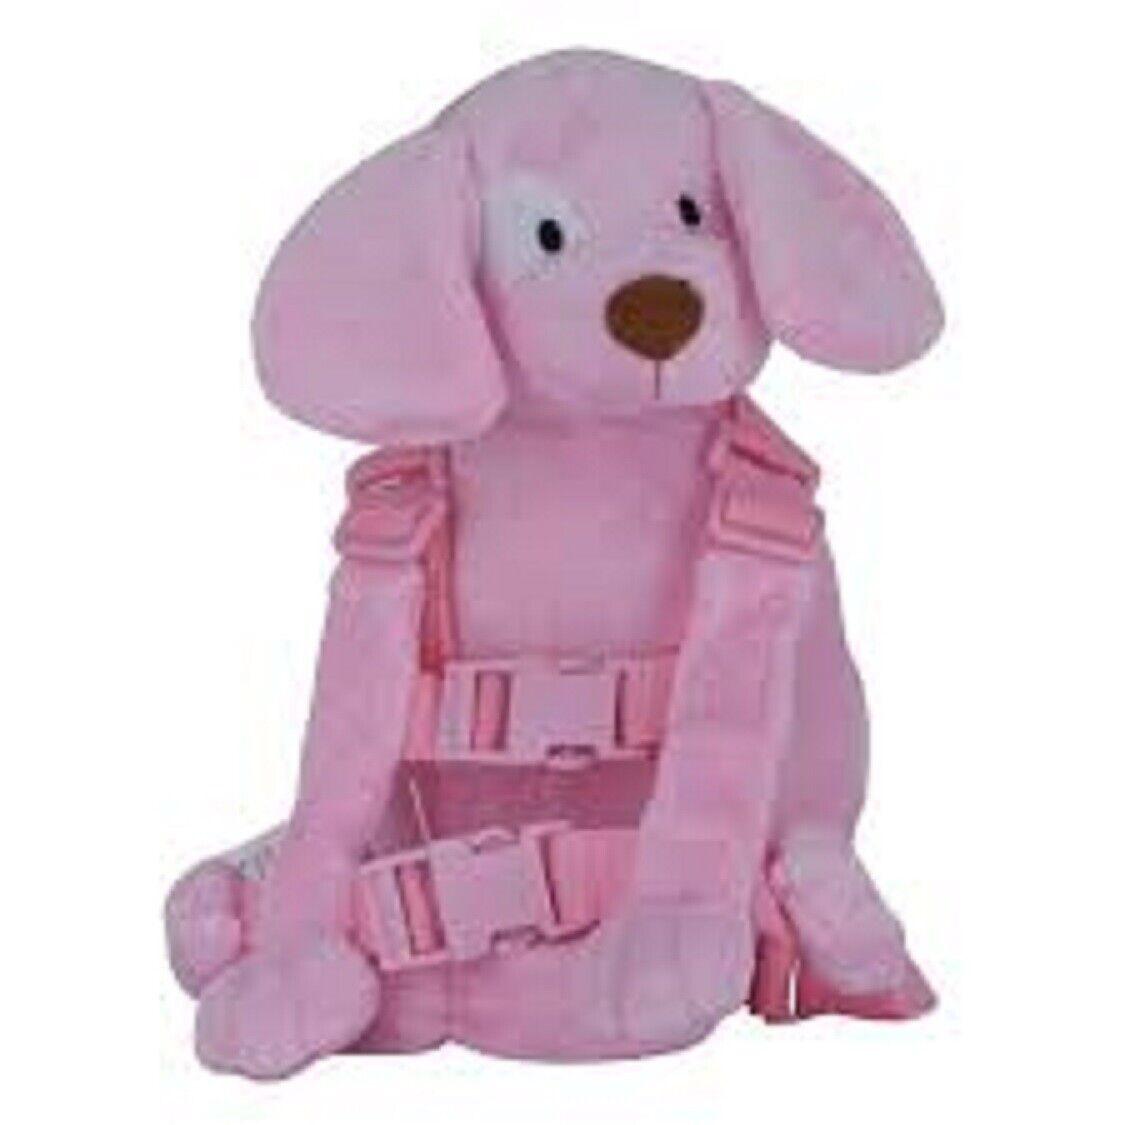 2 in 1 Elephant Toddler Safety Harness Kids Backpack Children/'s Walking Leash